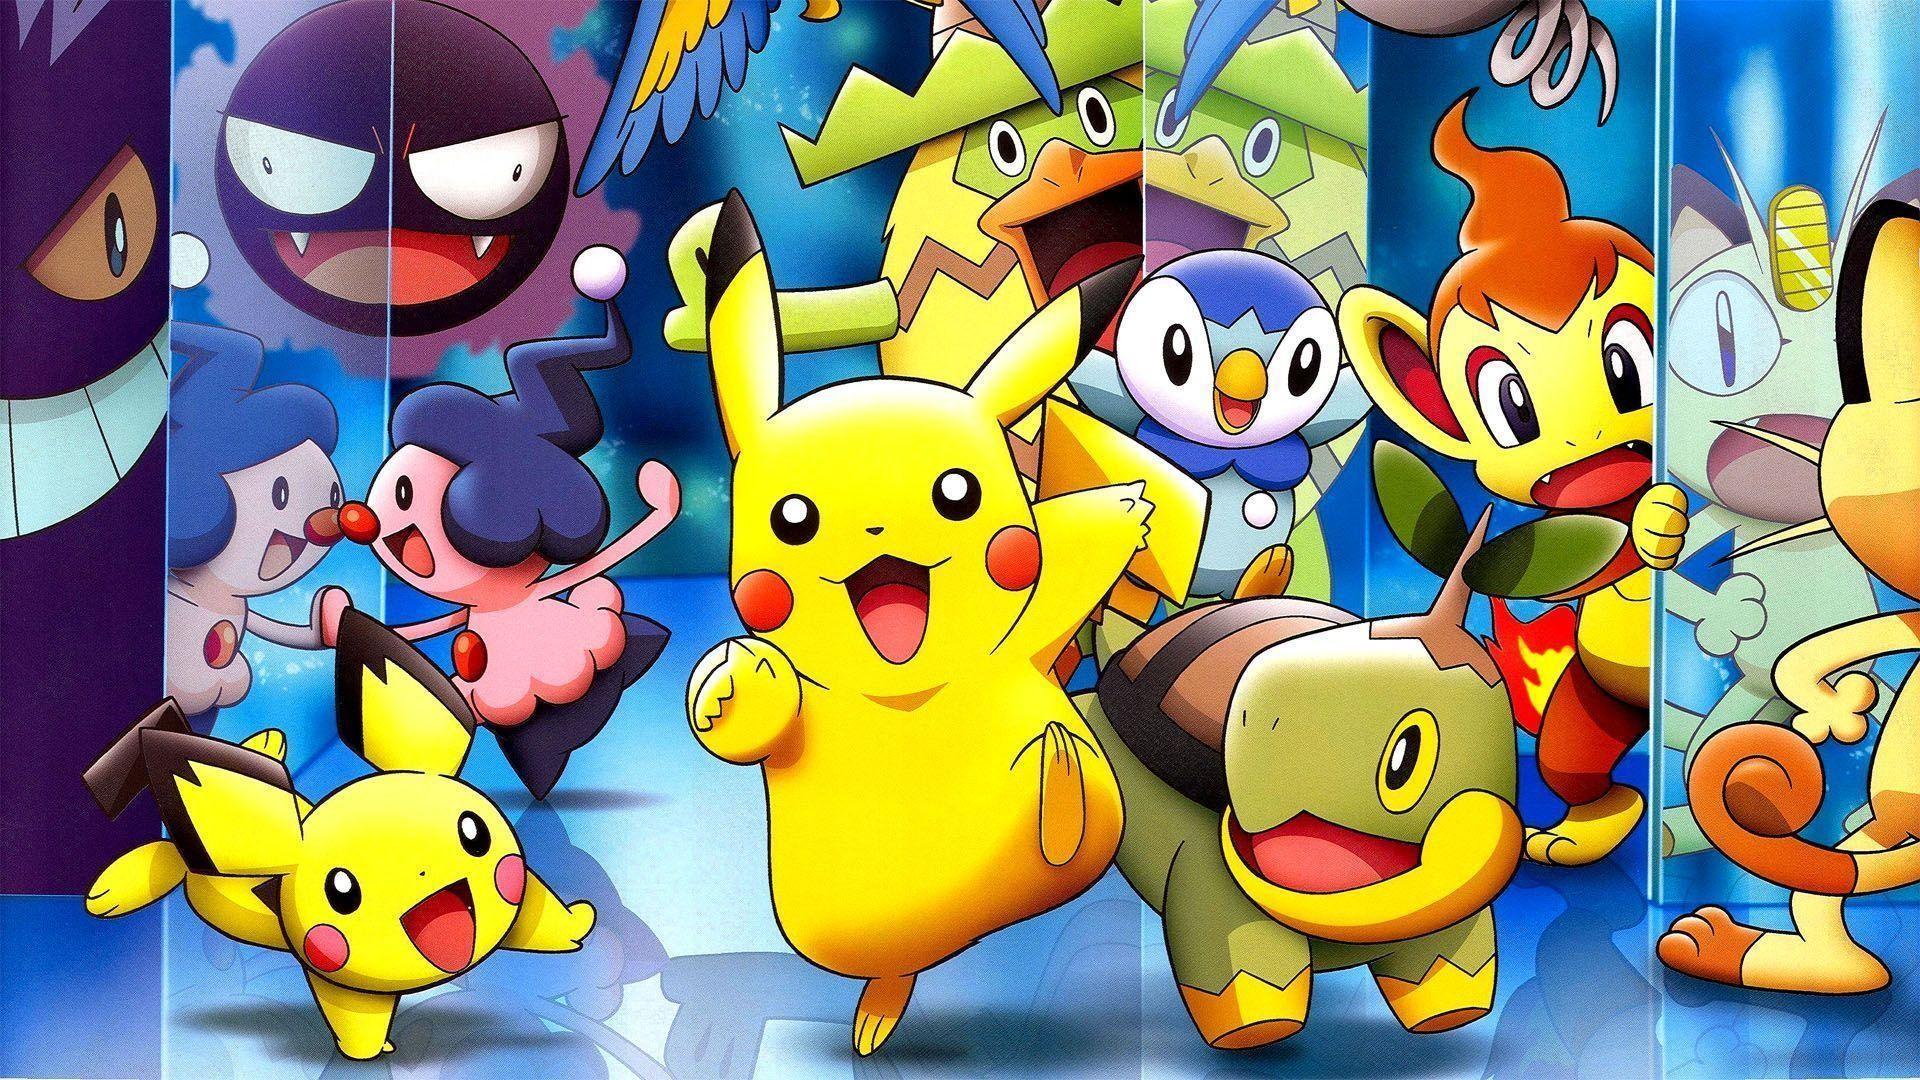 1 Pokémon Mystery Dungeon: Red Rescue Team Wallpapers | Pokémon .